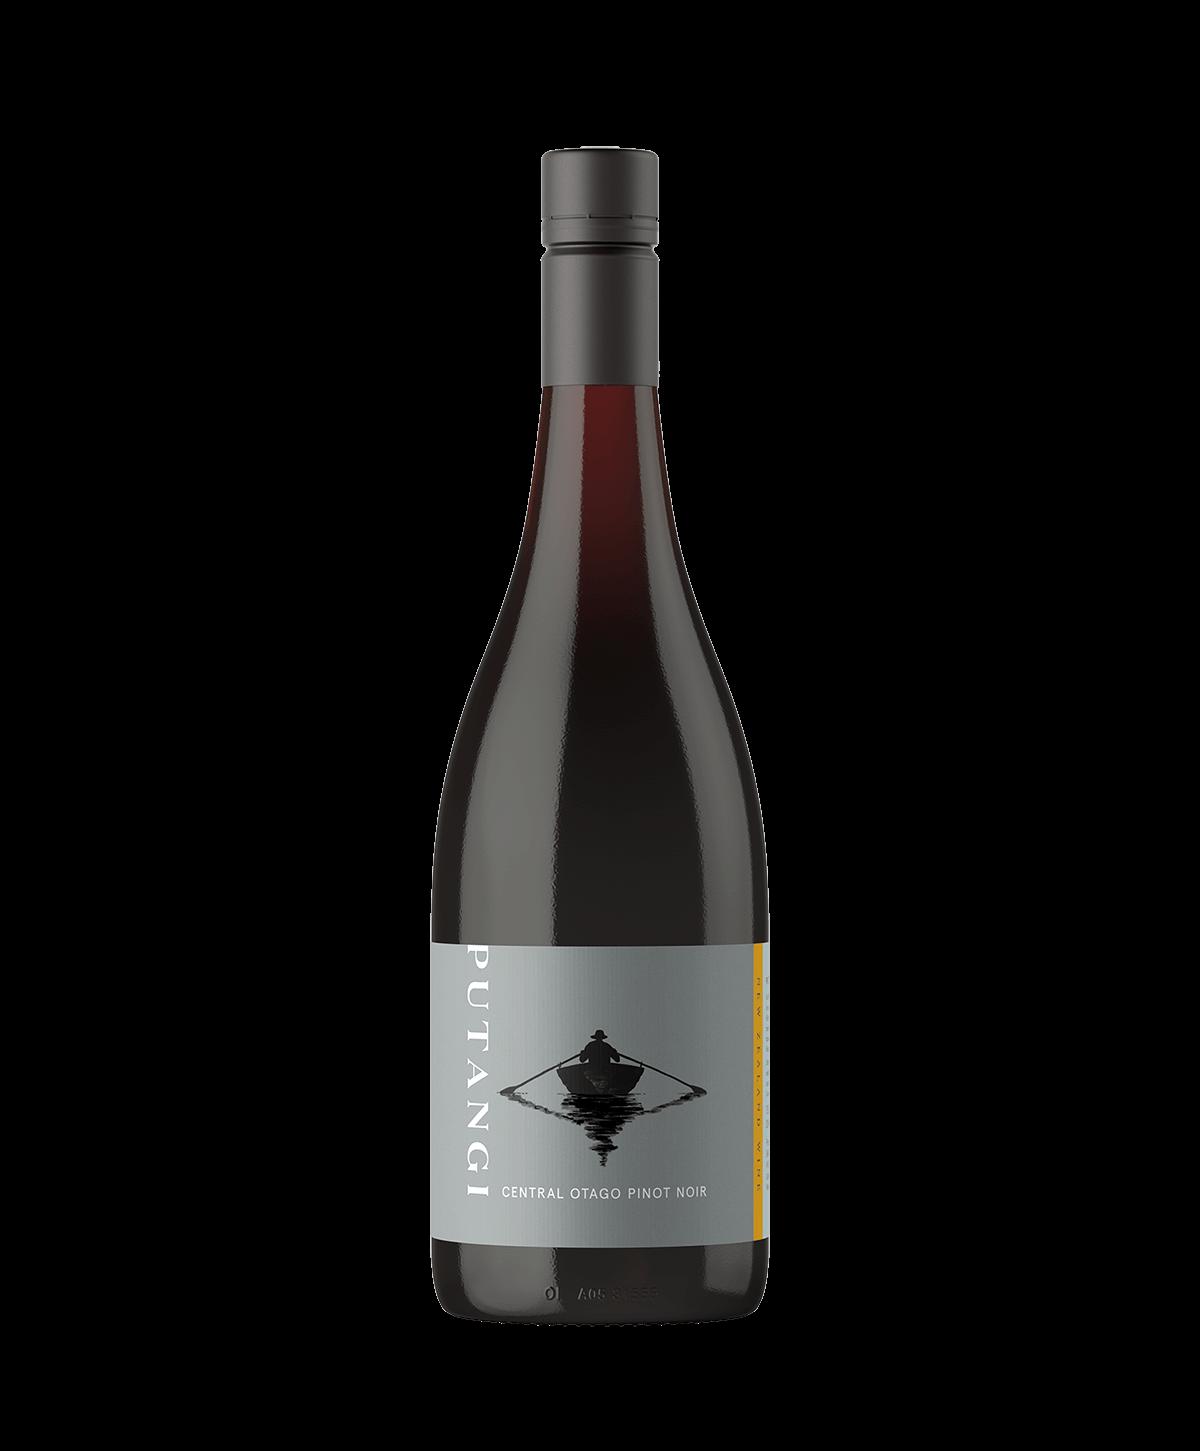 Central Otago Putangi Pinot Noir